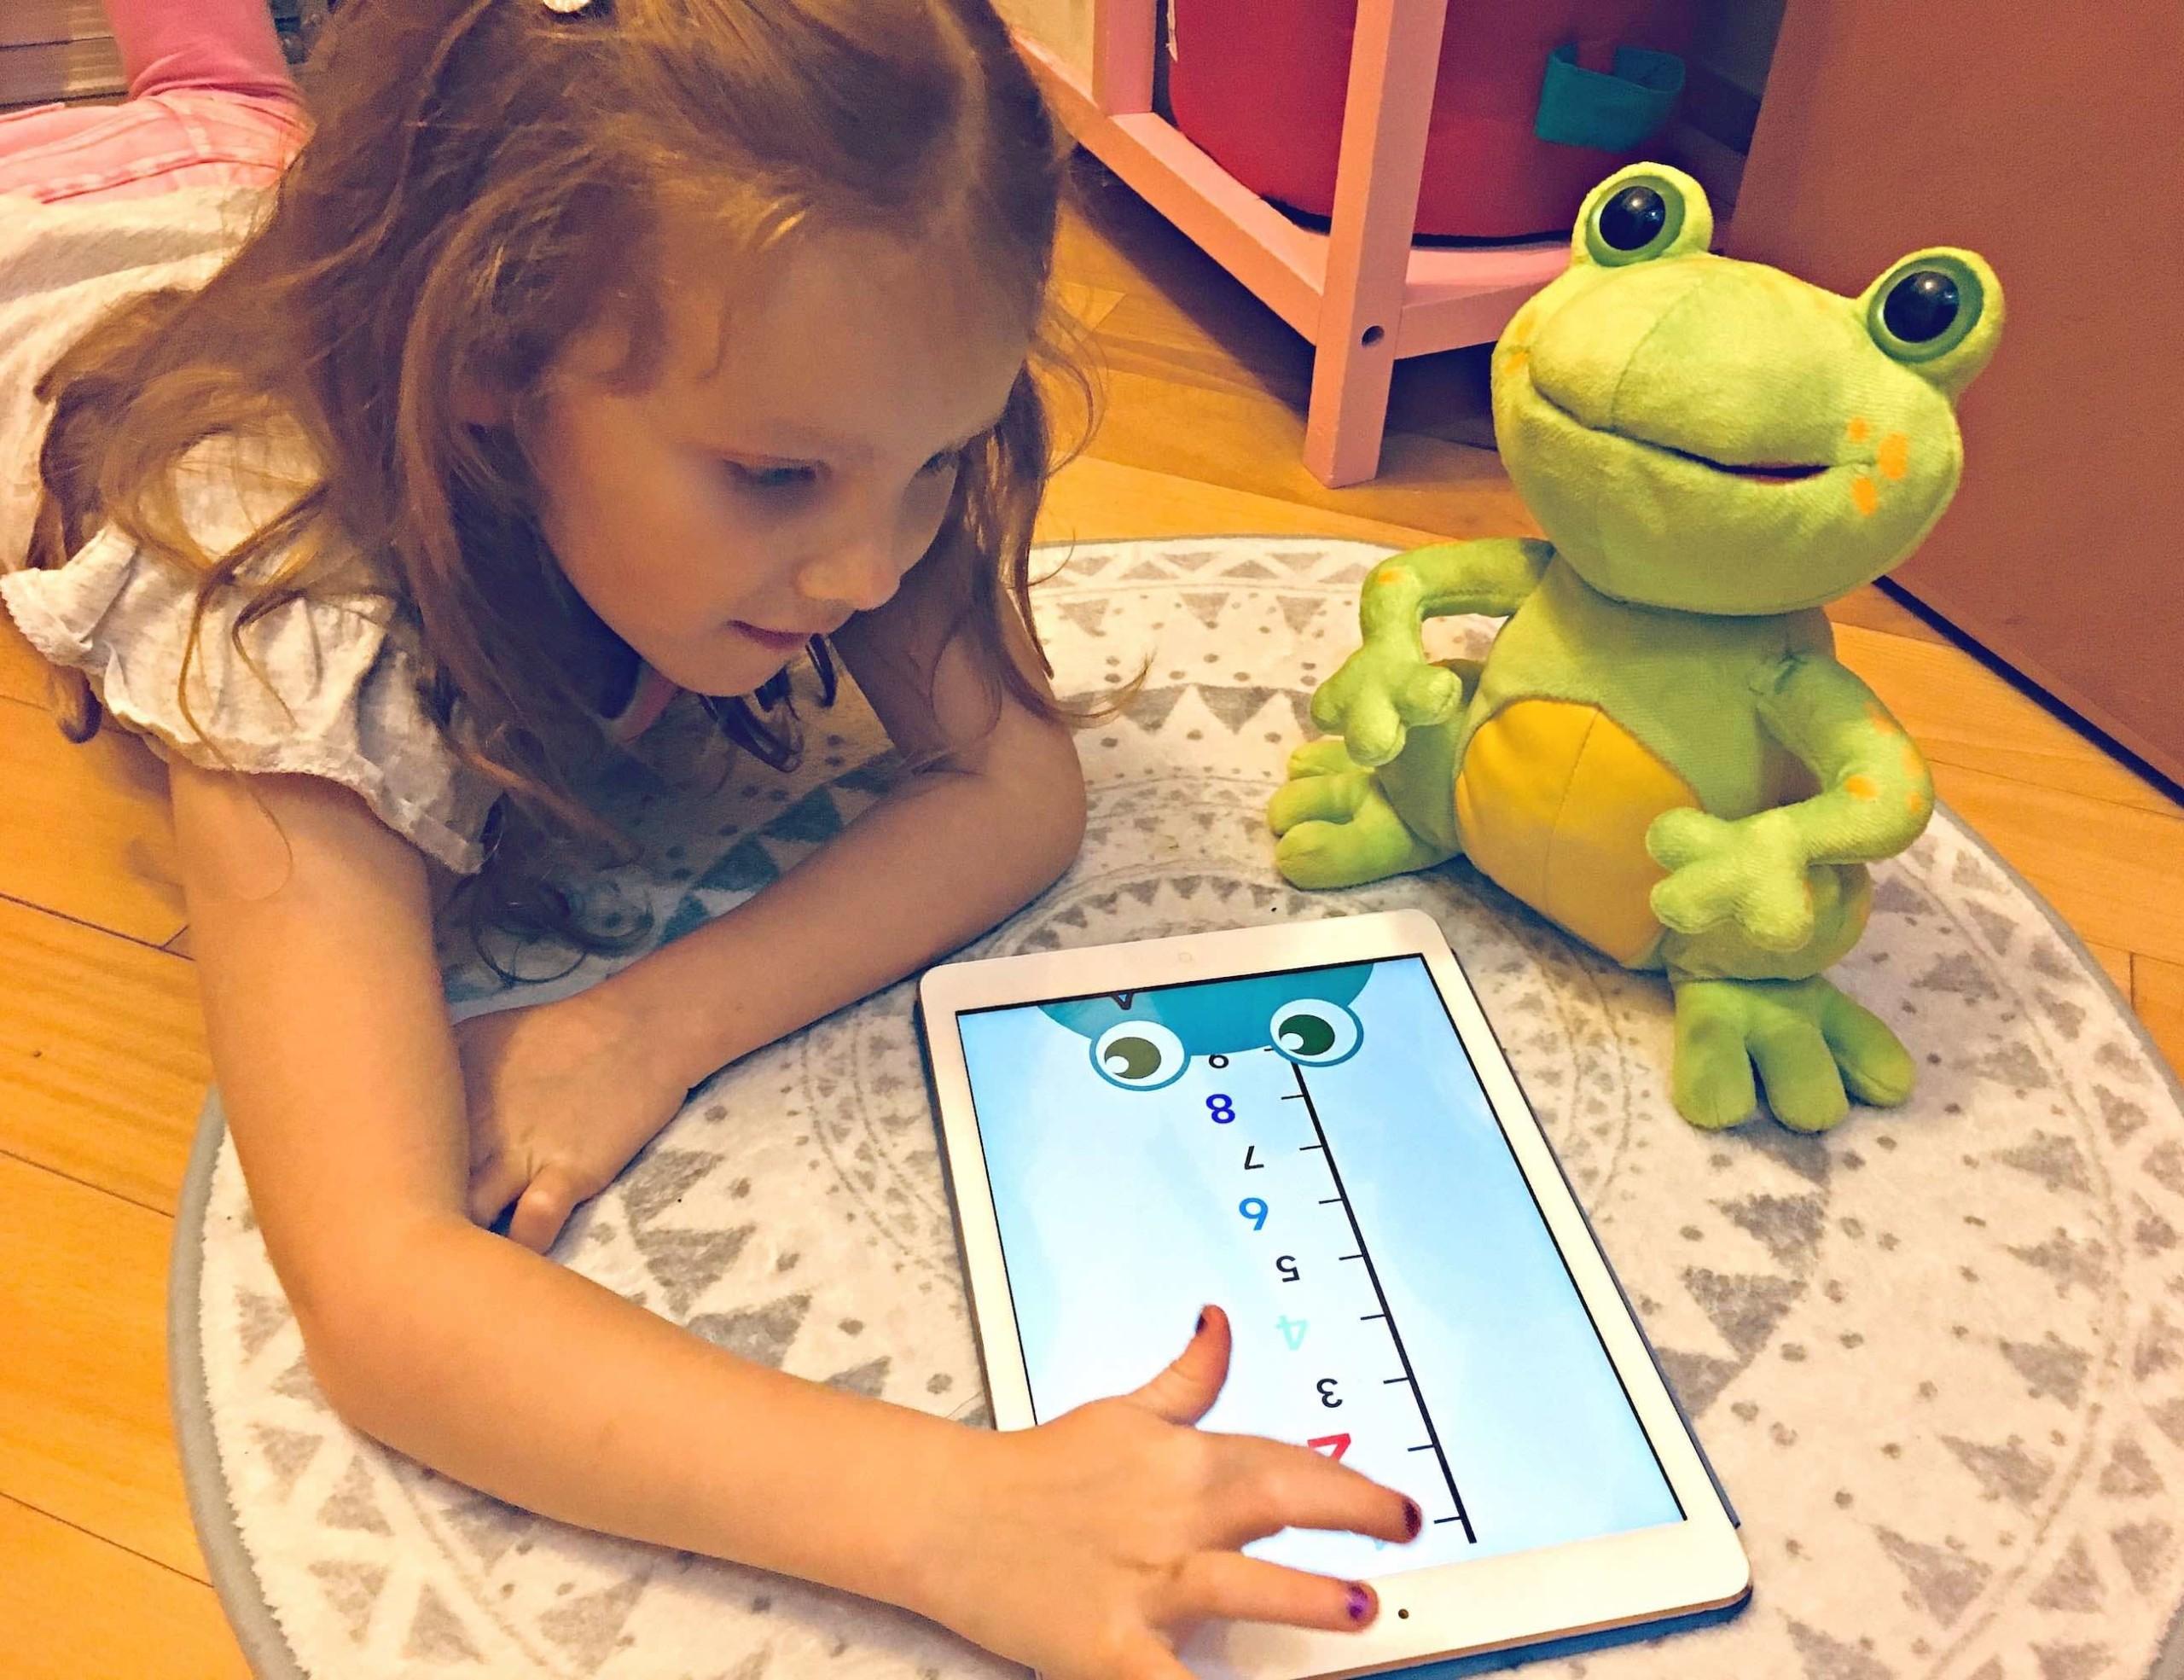 FroggySMART Smart Interactive Toy